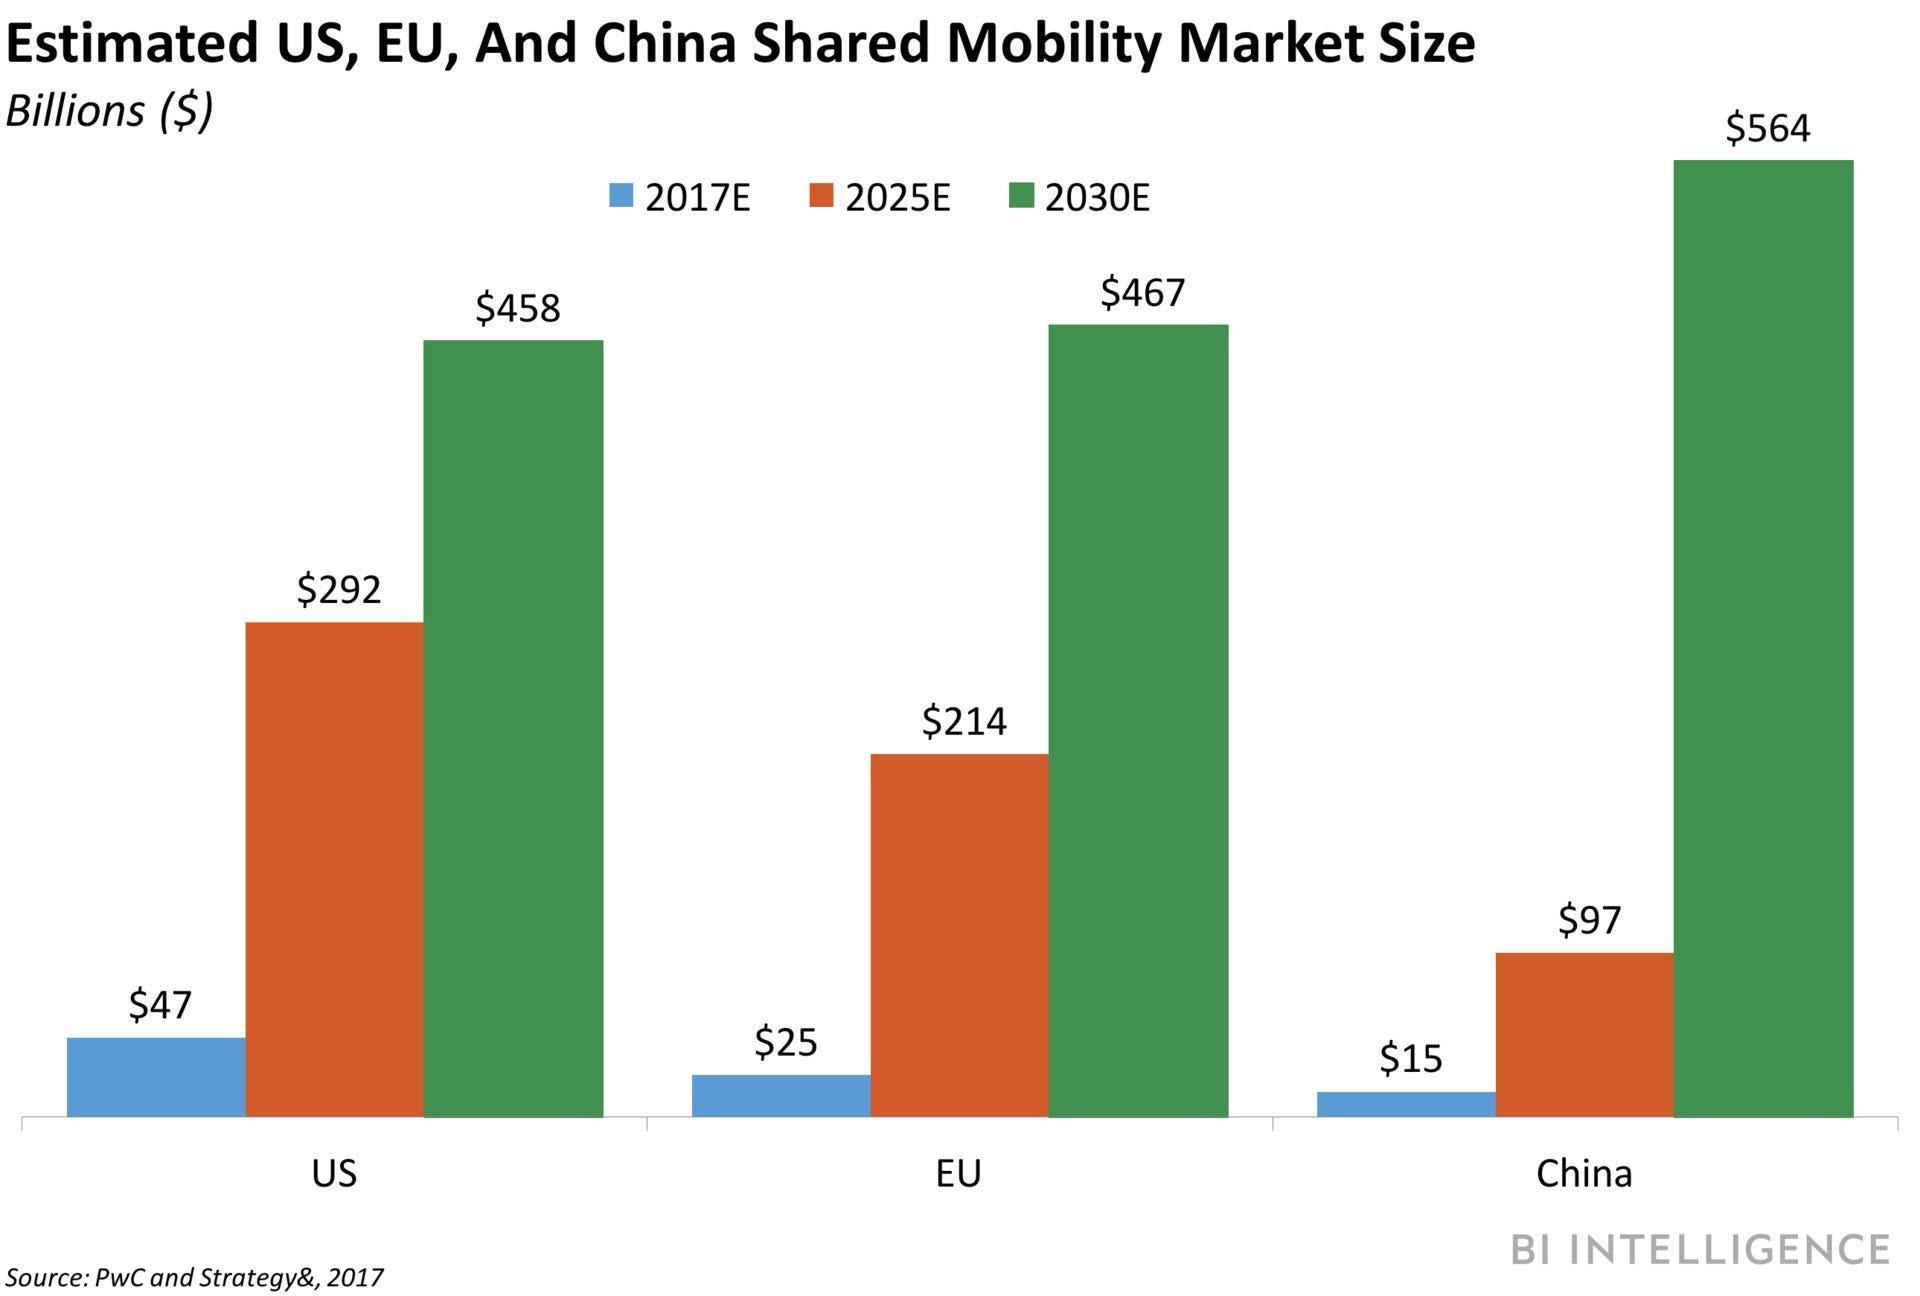 Mobility Market